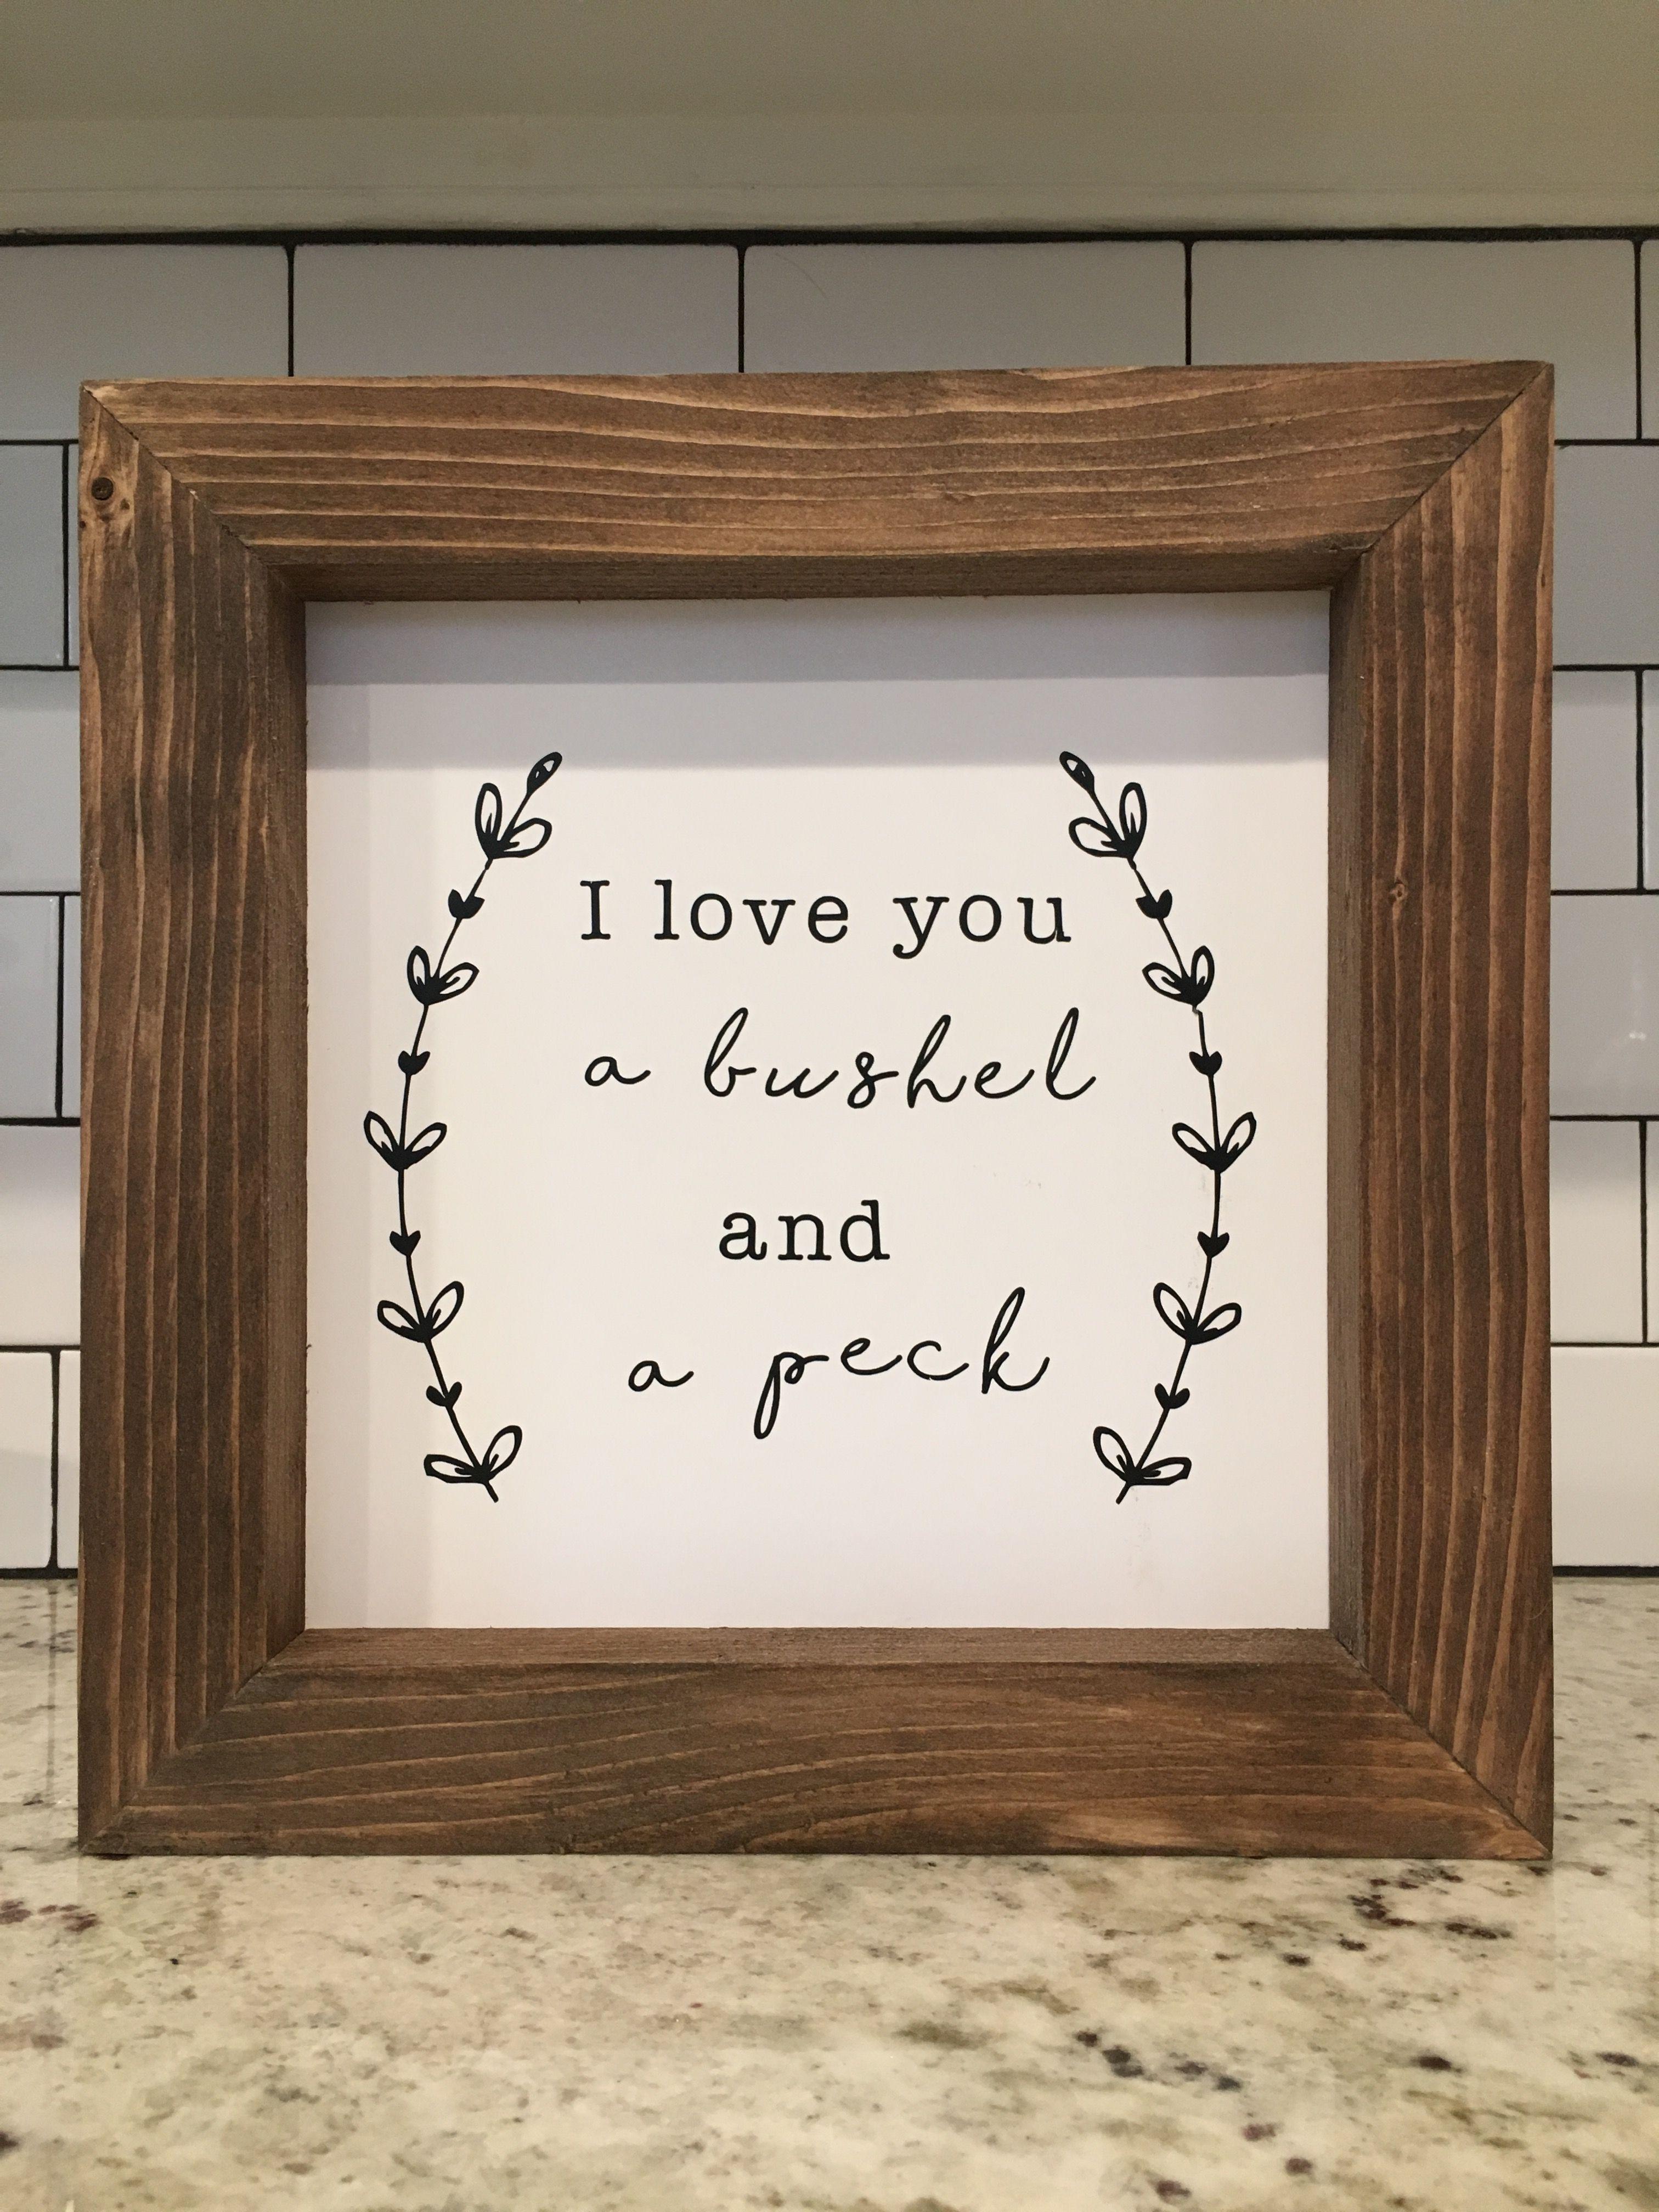 I love you a bushel and a peck wood sign @sawdustduo #woodsign ...